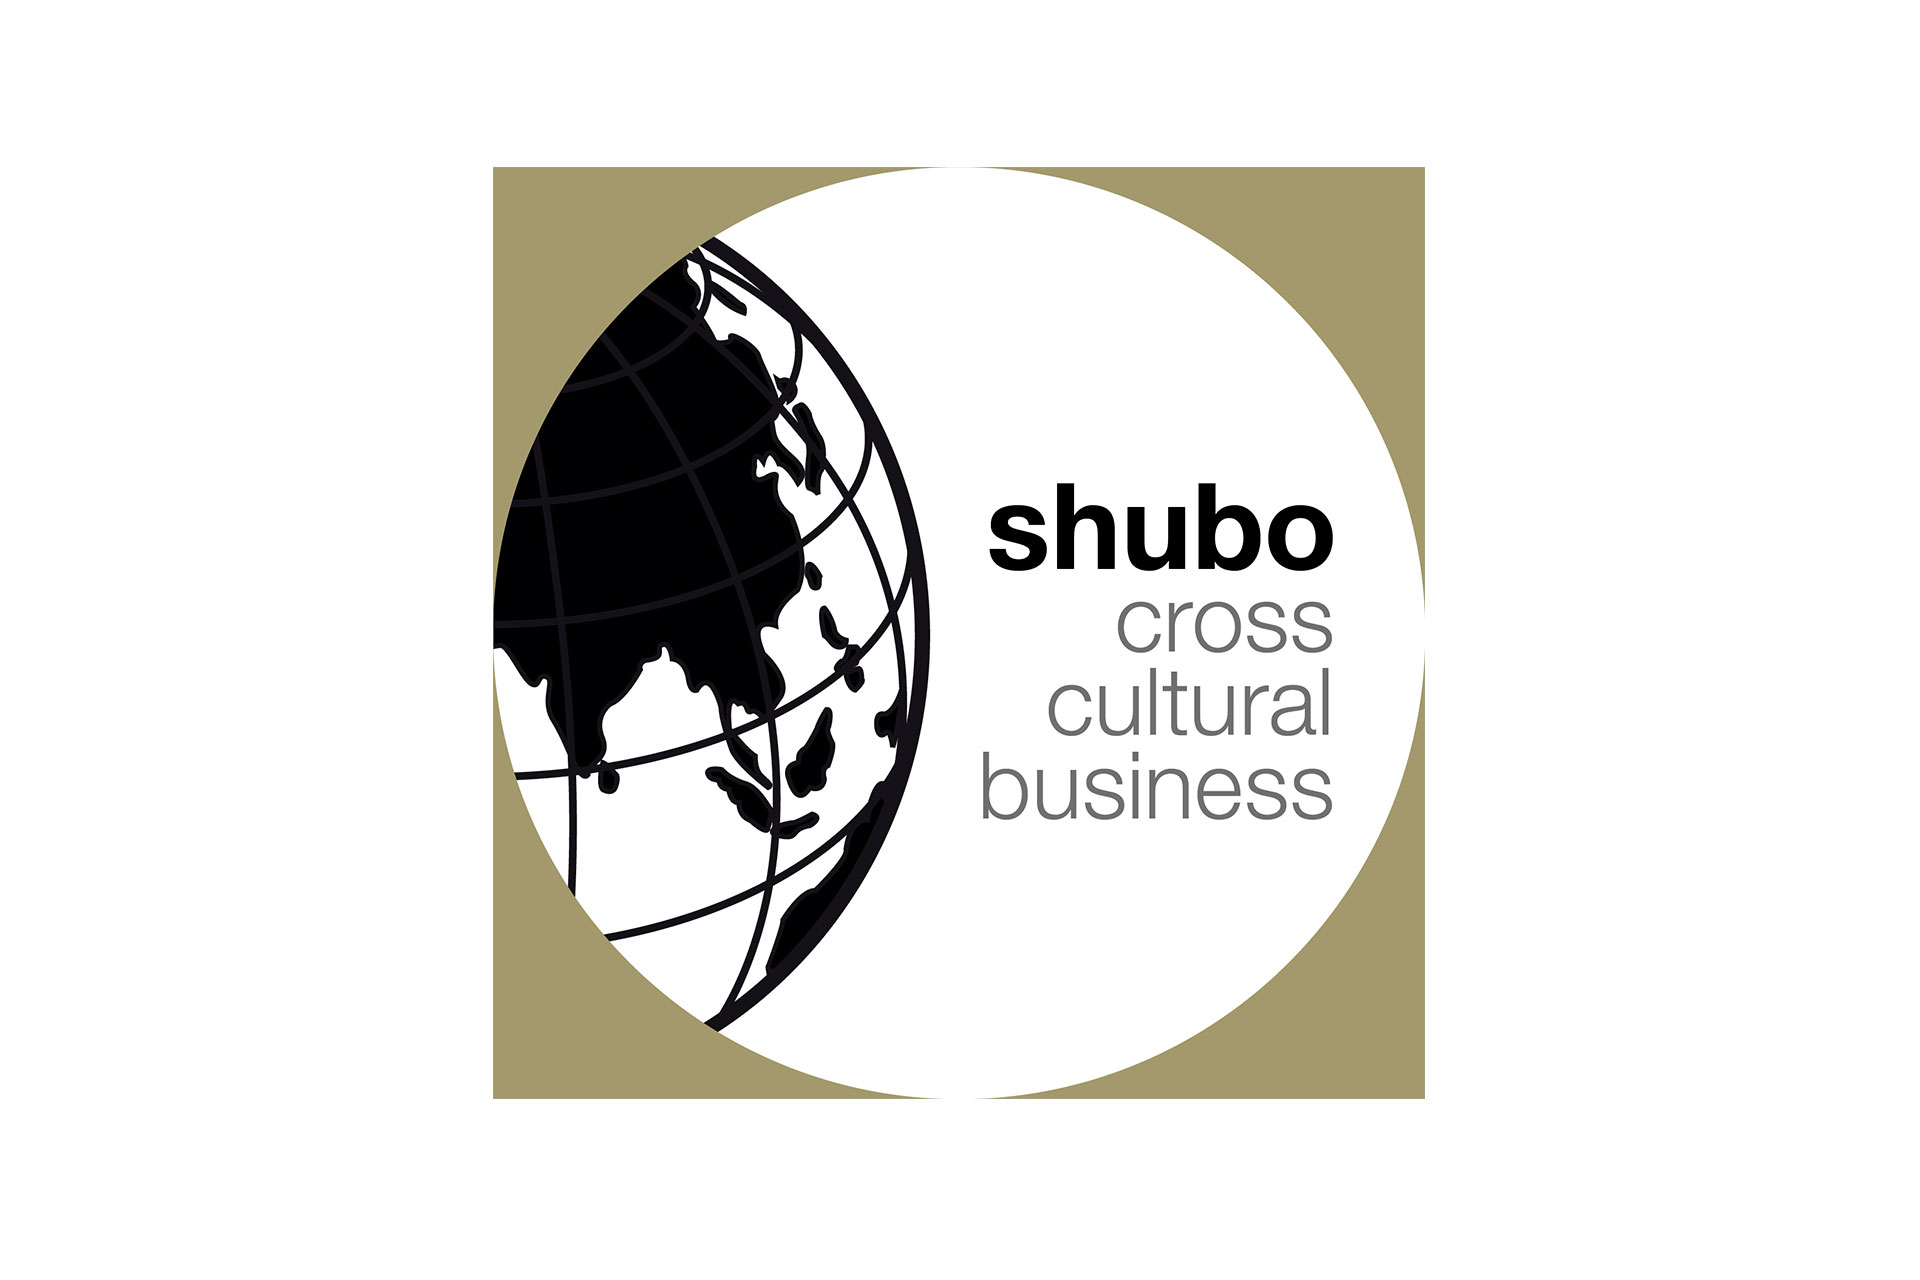 shubo-logo